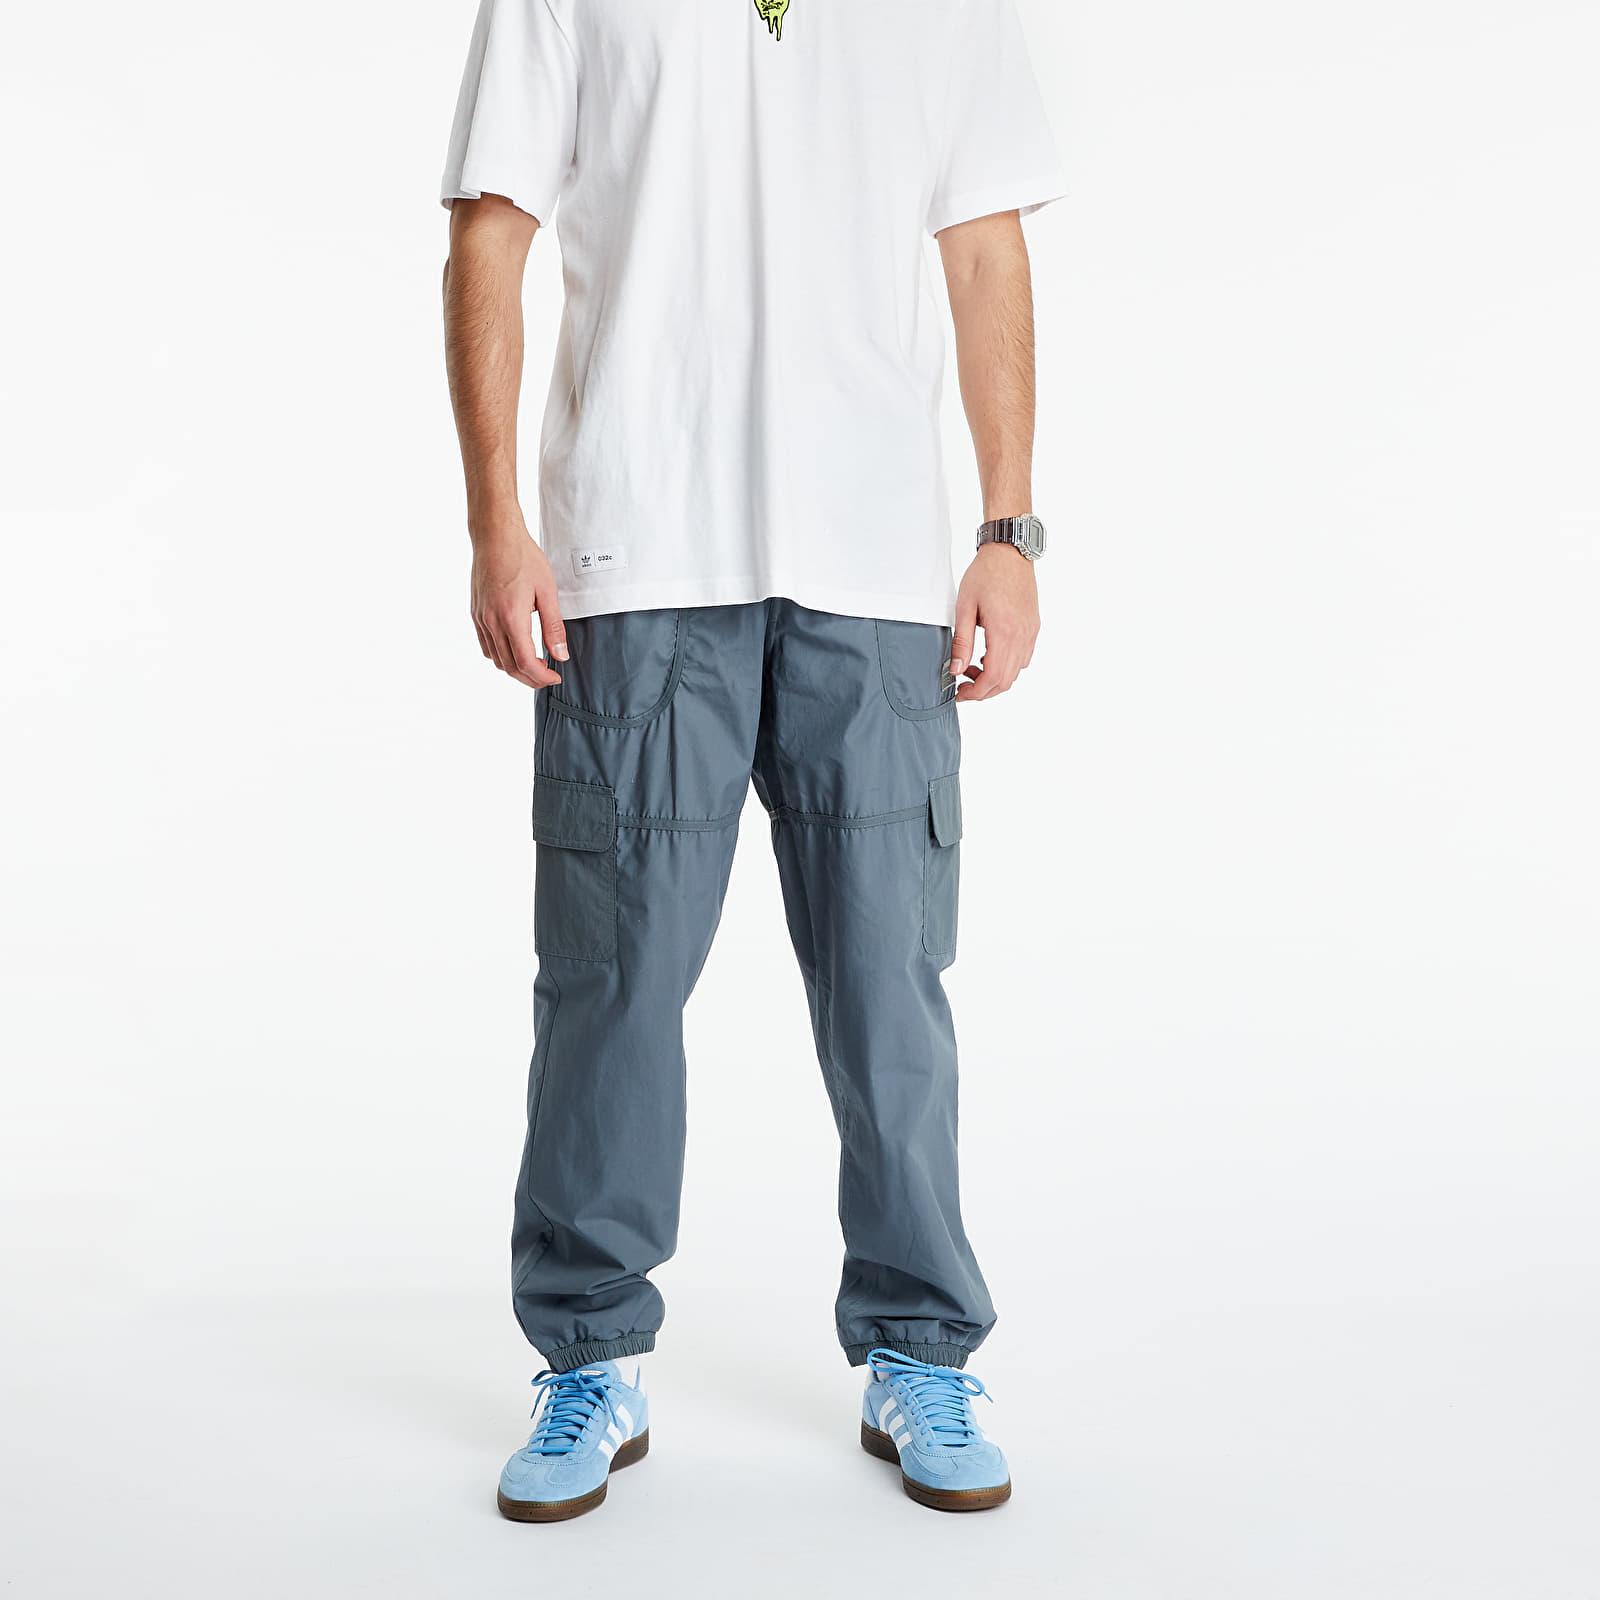 adidas Originals adidas Fashion Track Pants Blue Oxide  - Blue - Size: Small